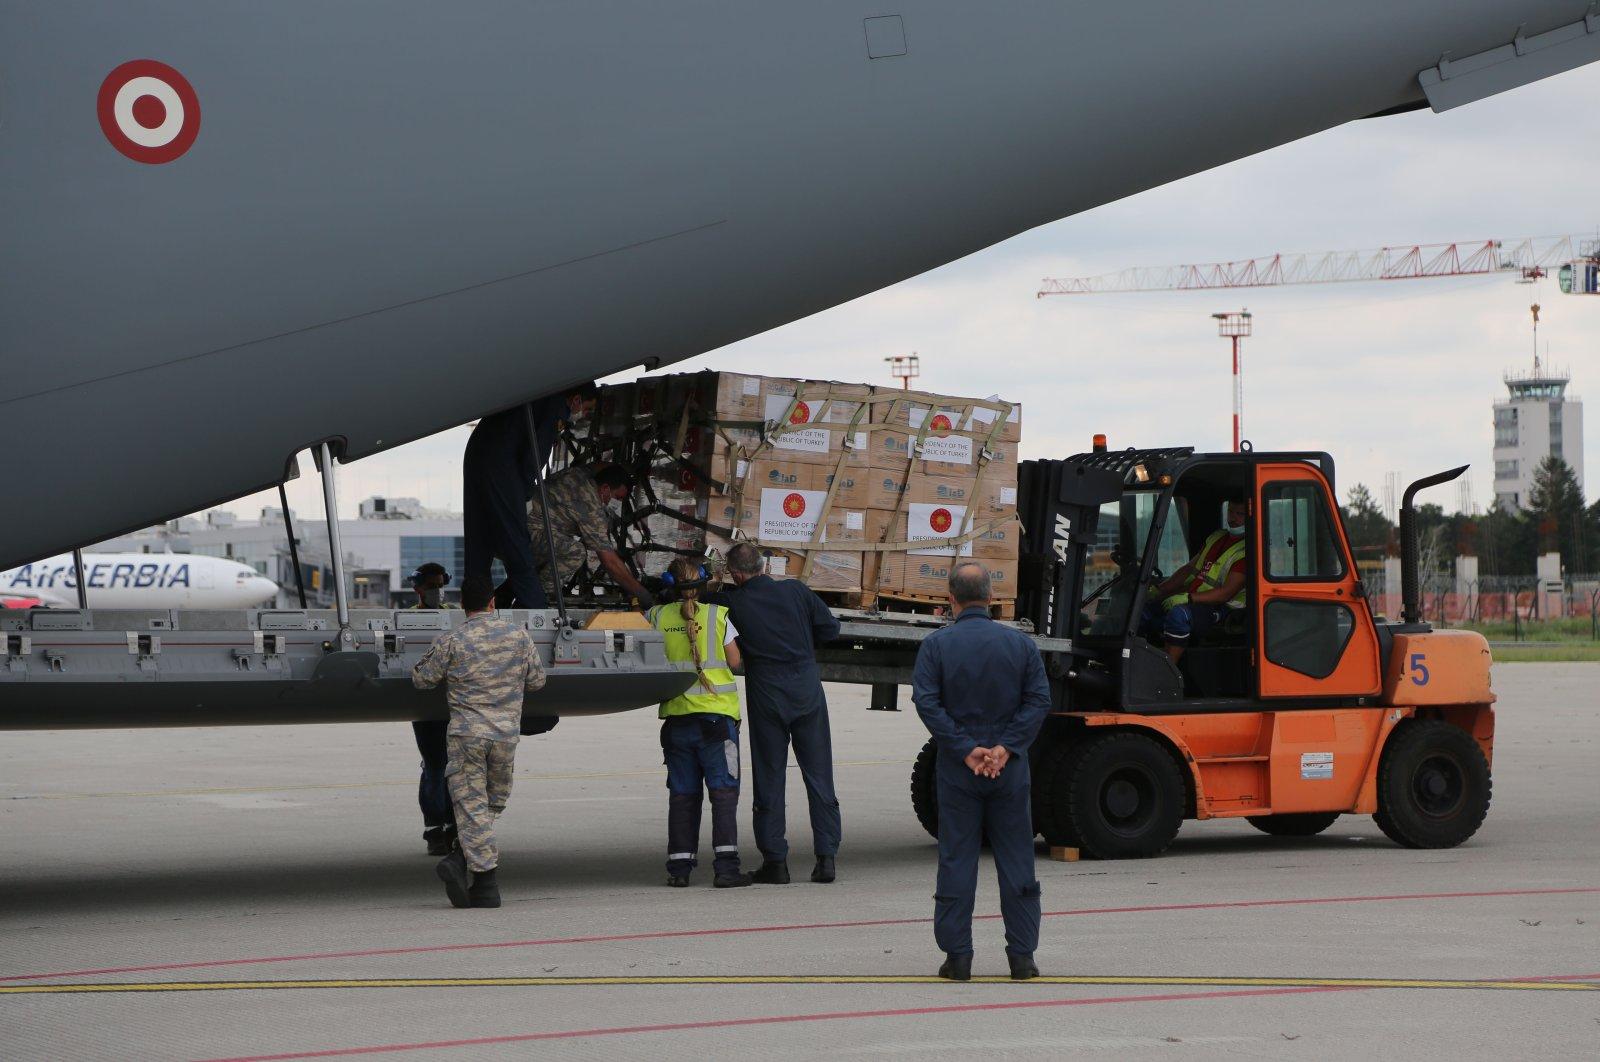 Airport workers unload Turkish equipment to be used in Serbia's fight against coronavirus at Nikola Tesla Airport, Belgrade, July 4, 2020. (AA Photo)